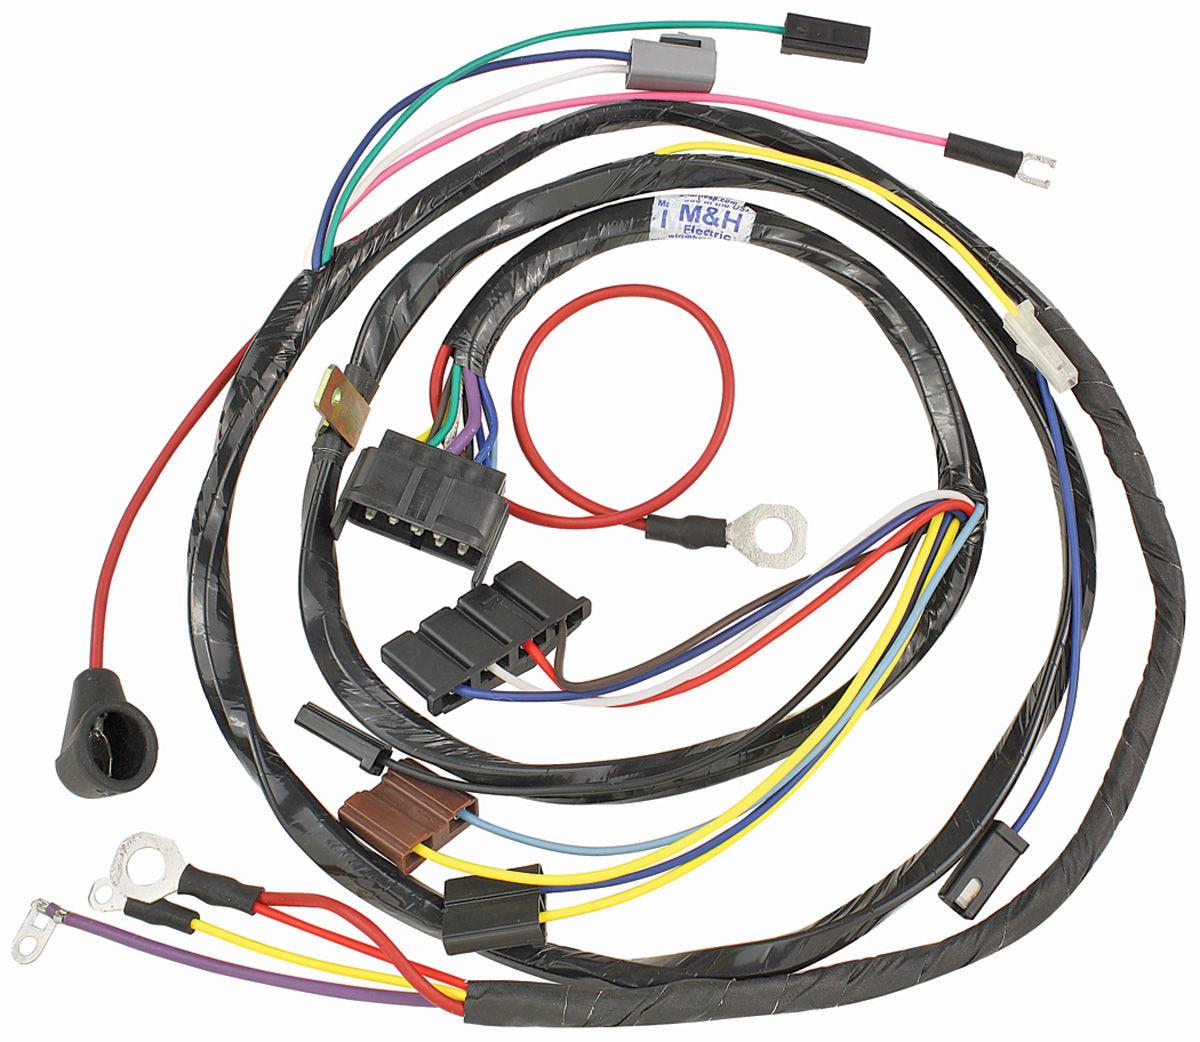 medium resolution of wiring harness for 1964 buick riviera wiring library rh 8 bloxhuette de 1962 buick riviera 1963 buick riviera